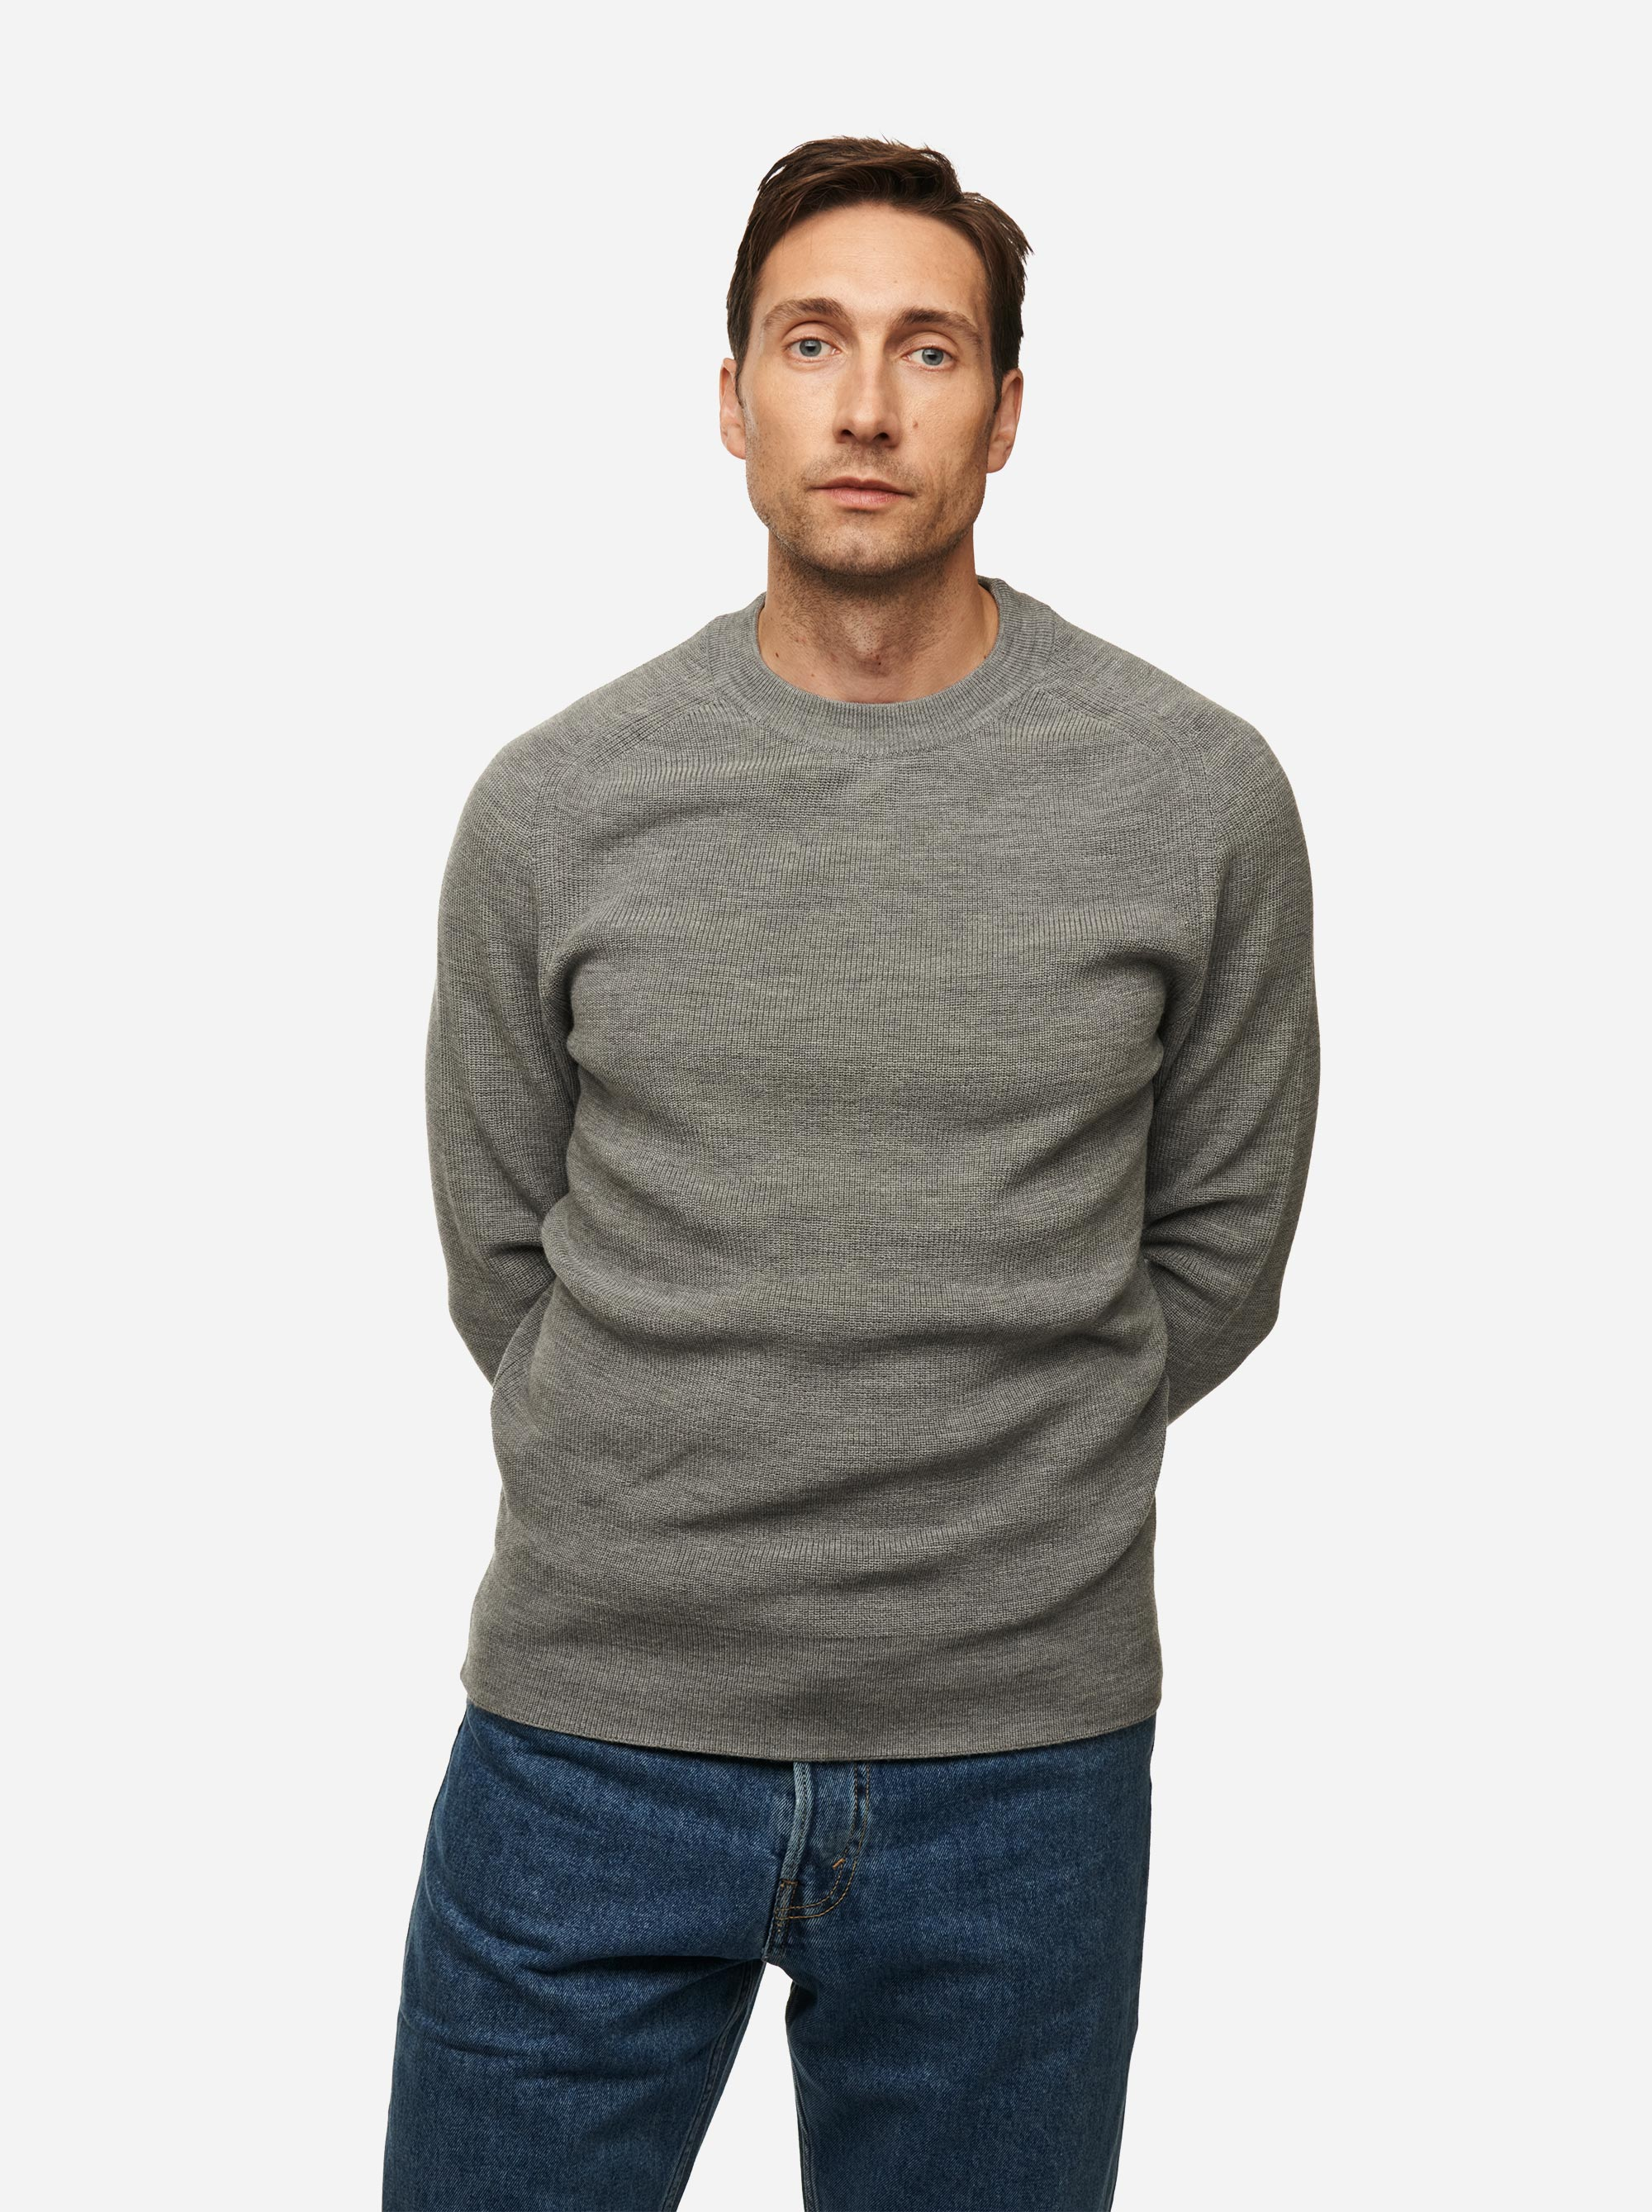 Teym - Crewneck - The Merino Sweater - Men - Grey - 1